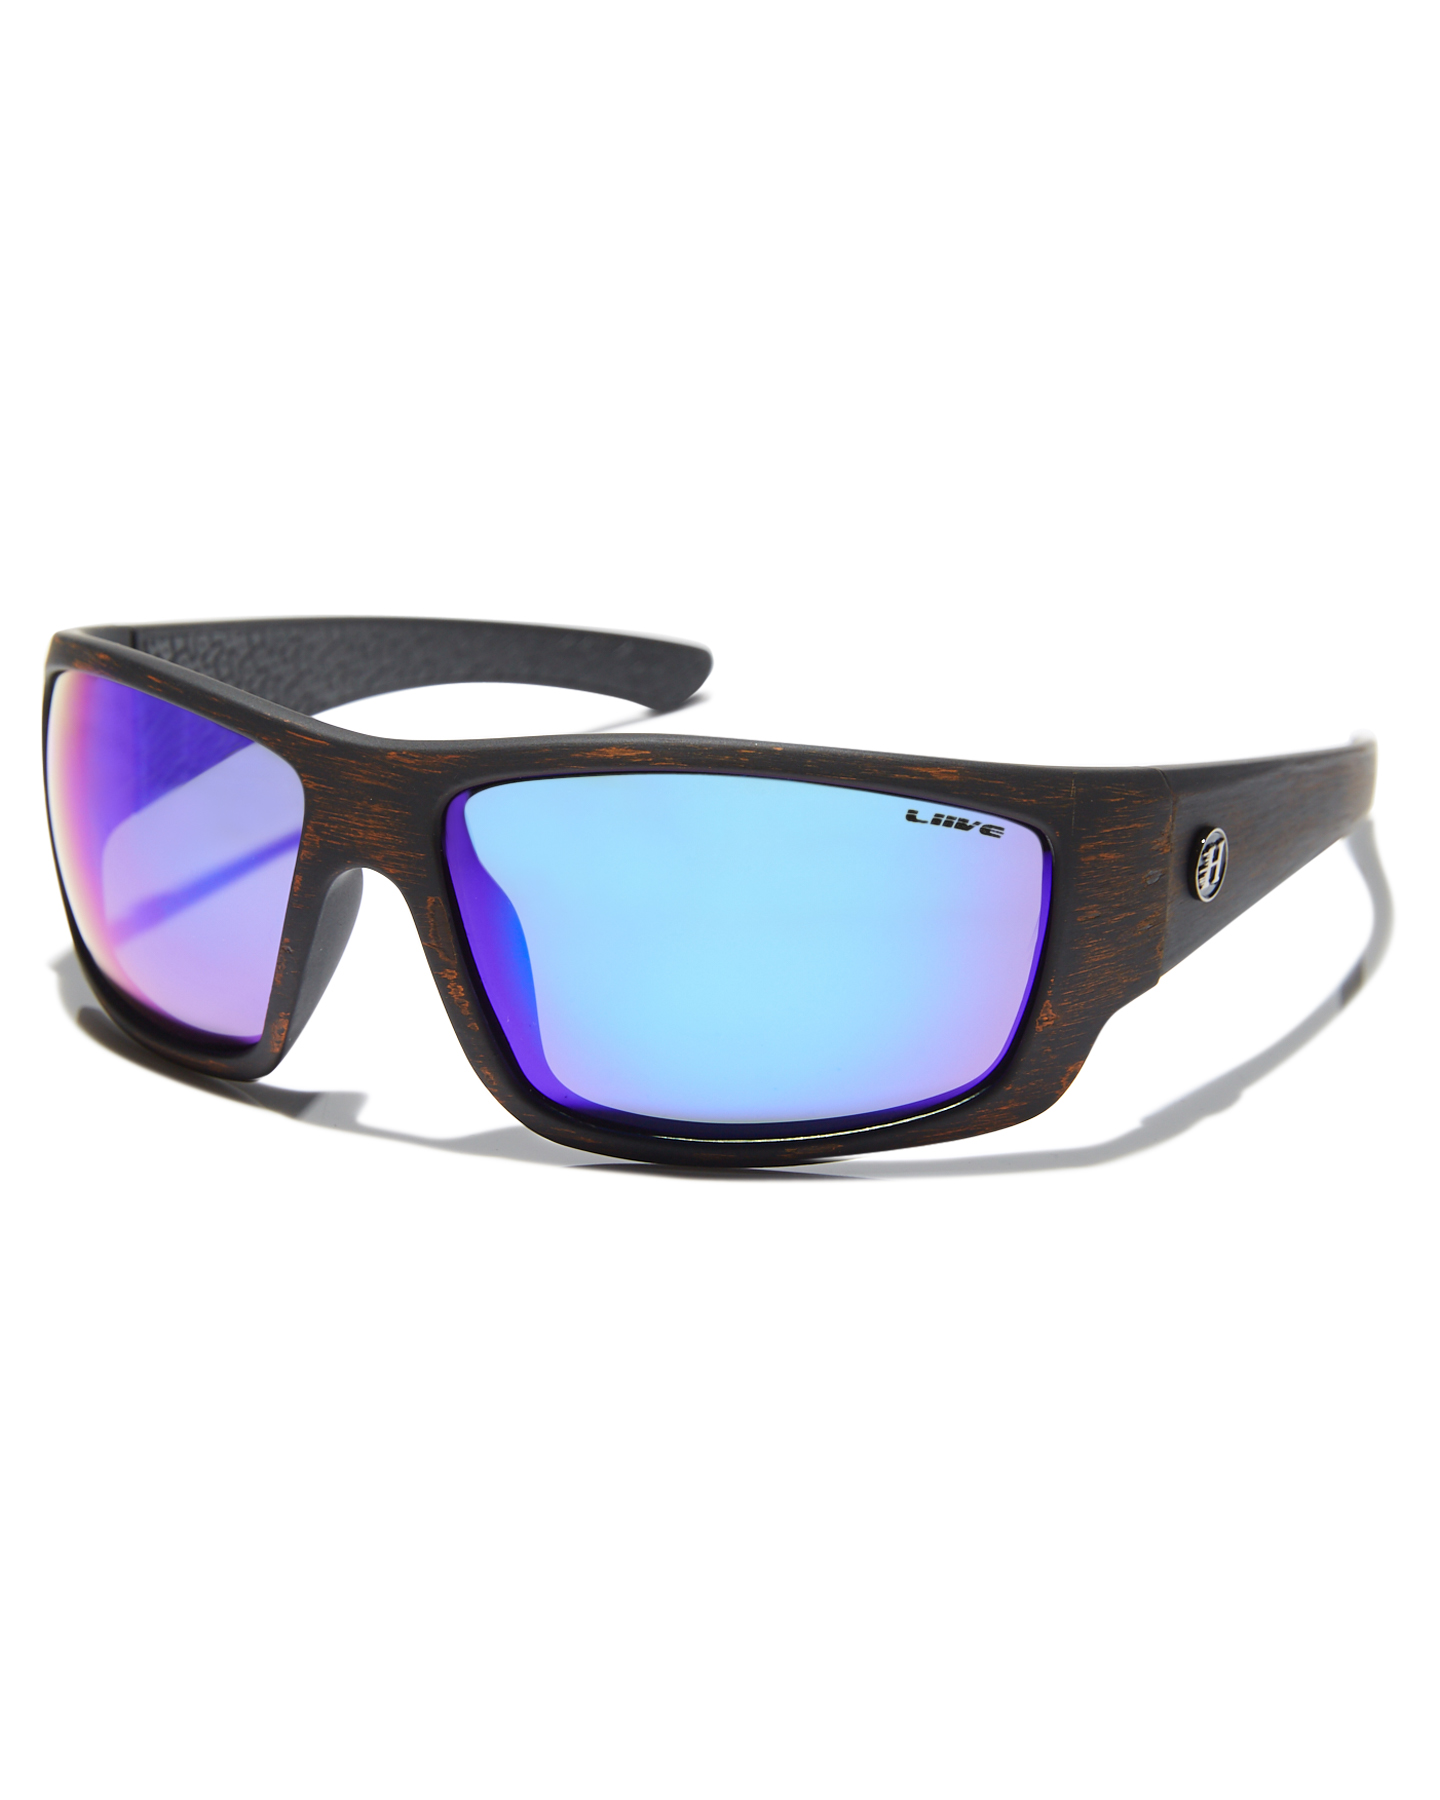 139c21e6187 Liive Vision X Mad Hueys Anchor Polarised Sunglasses Black Wood Mens ...